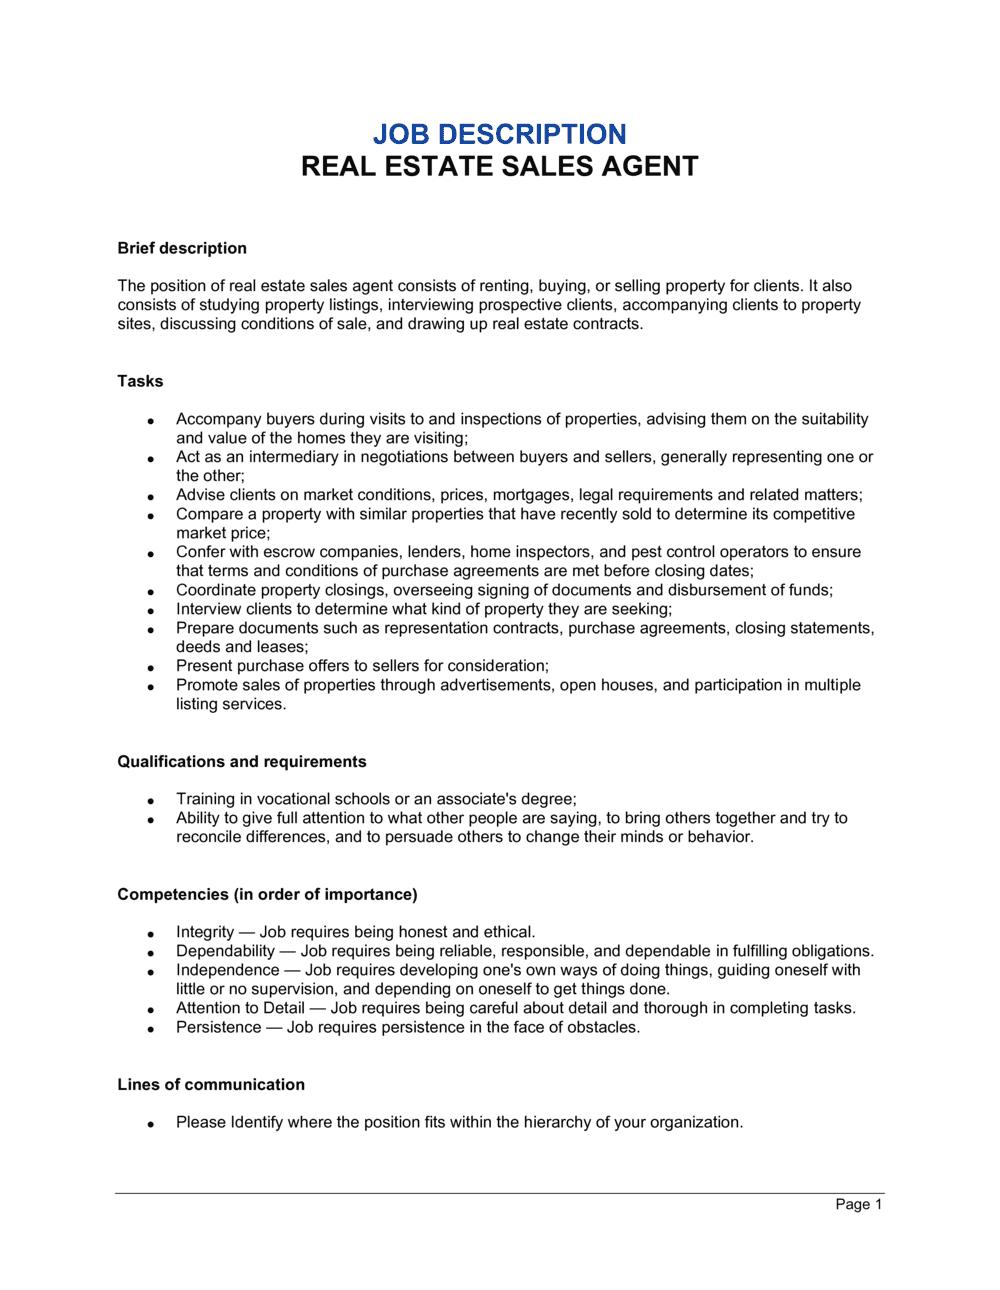 Business-in-a-Box's Real Estate Sales Agent Job Description Template